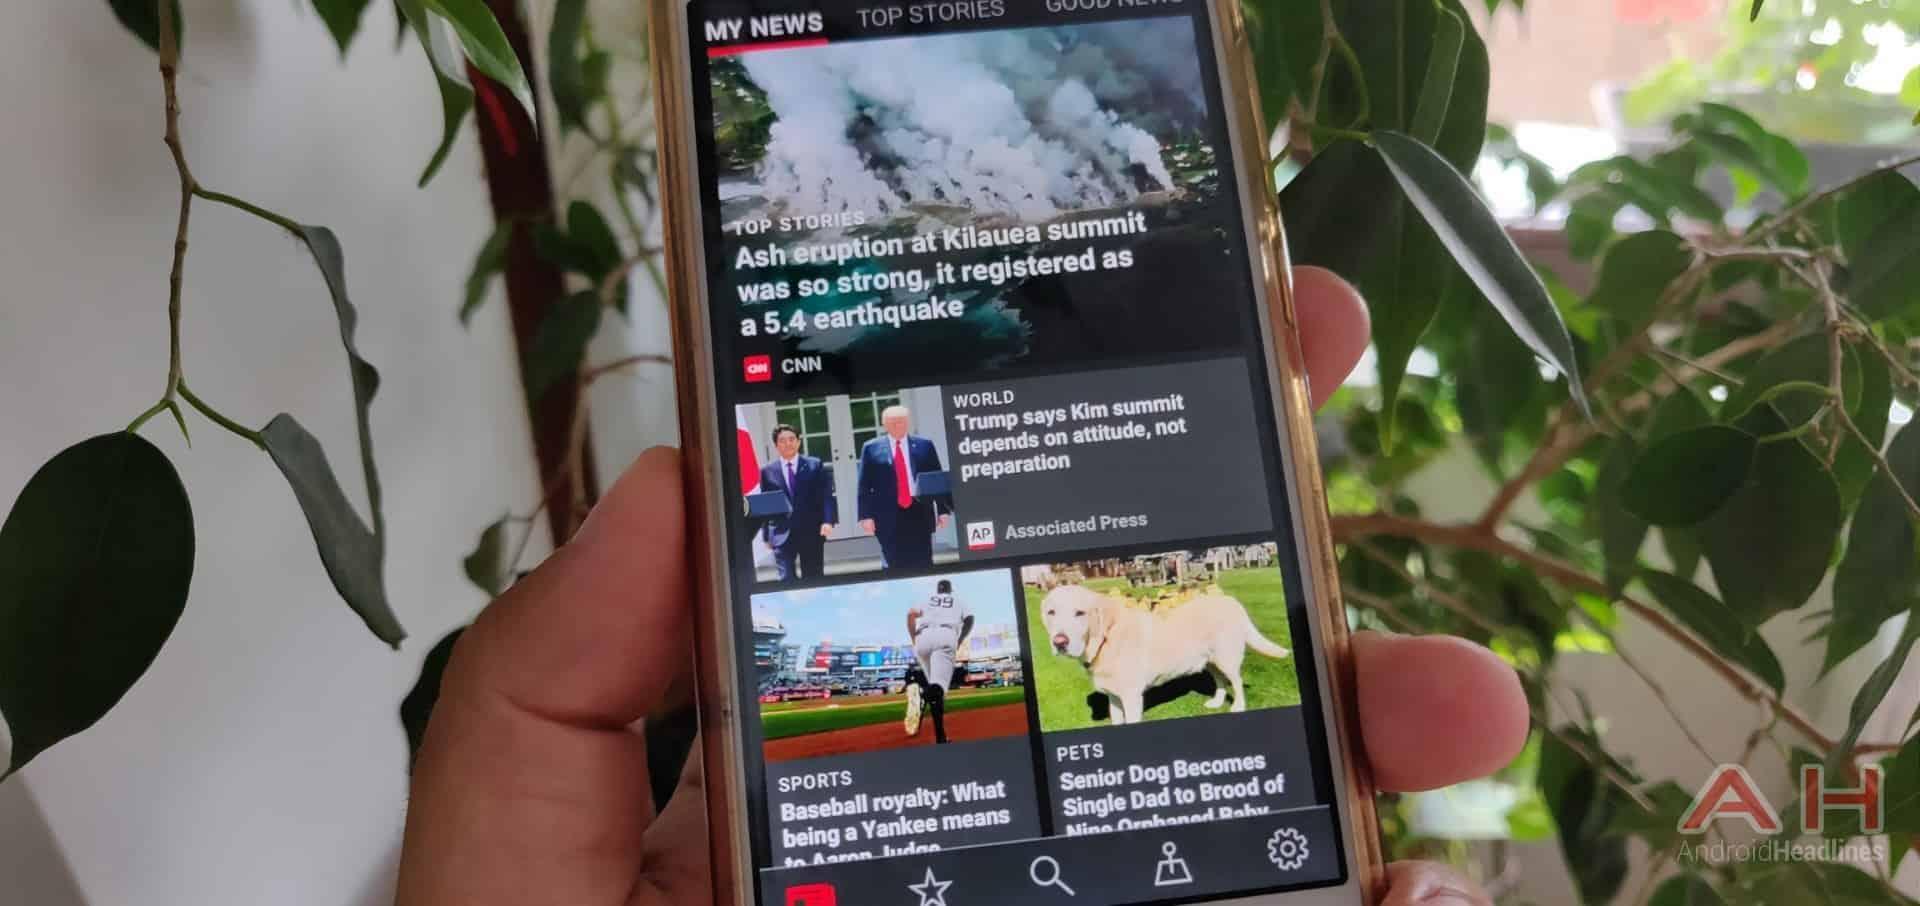 AH Microsoft News app 1